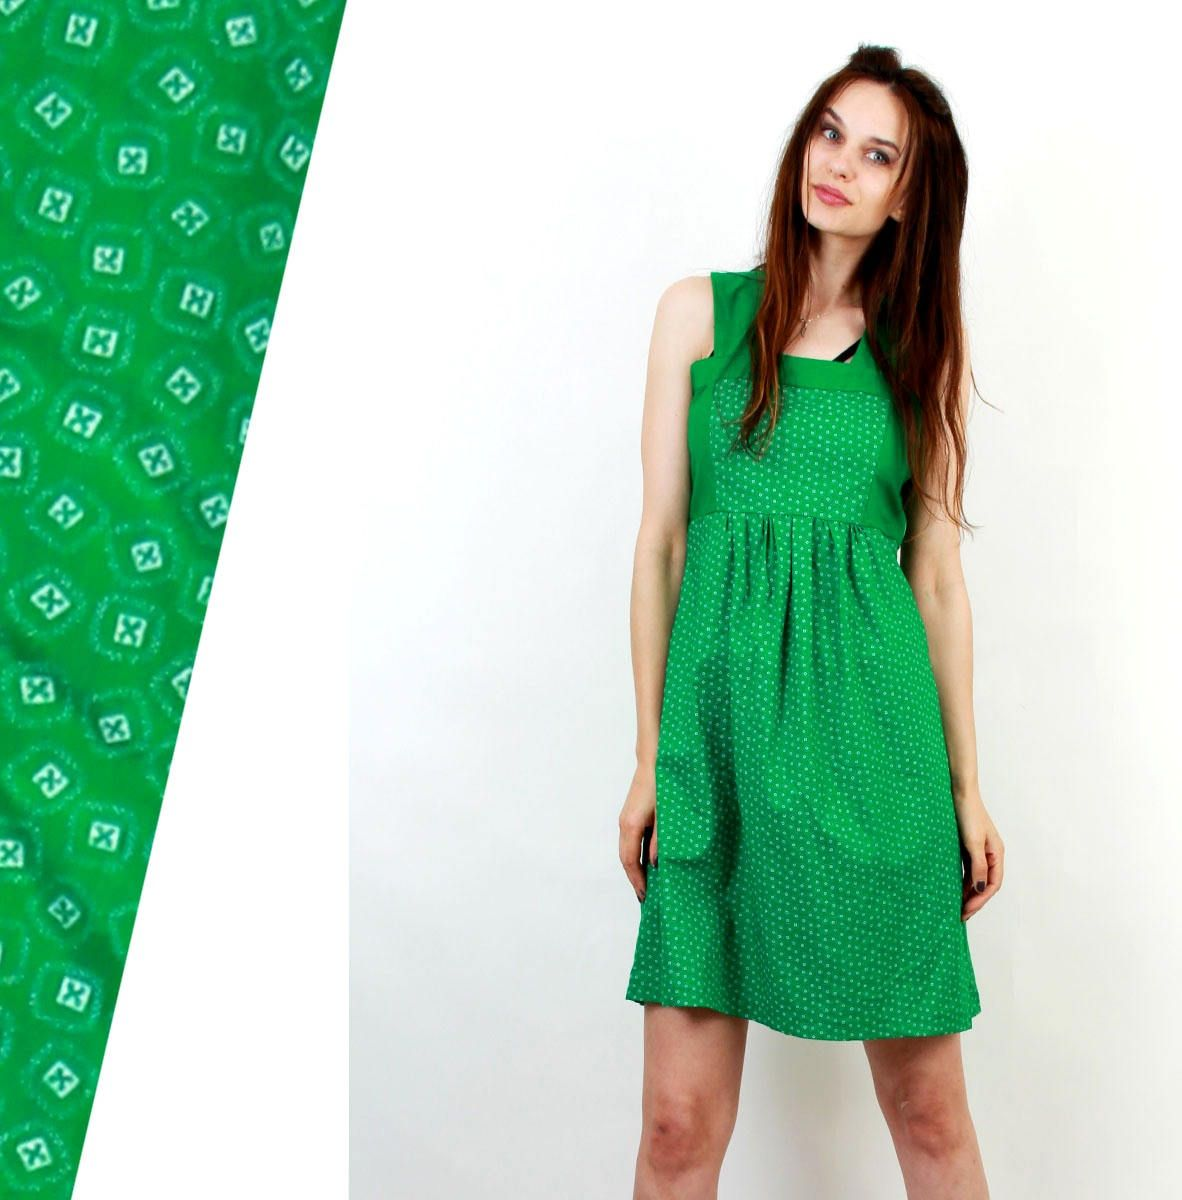 Trachten Green Dress / Trachten Dress / Dirndl Dress / Vintage Green Dress / Cotton Dress / Folk Dress / Medium Size Dress / by Ramaci on Etsy